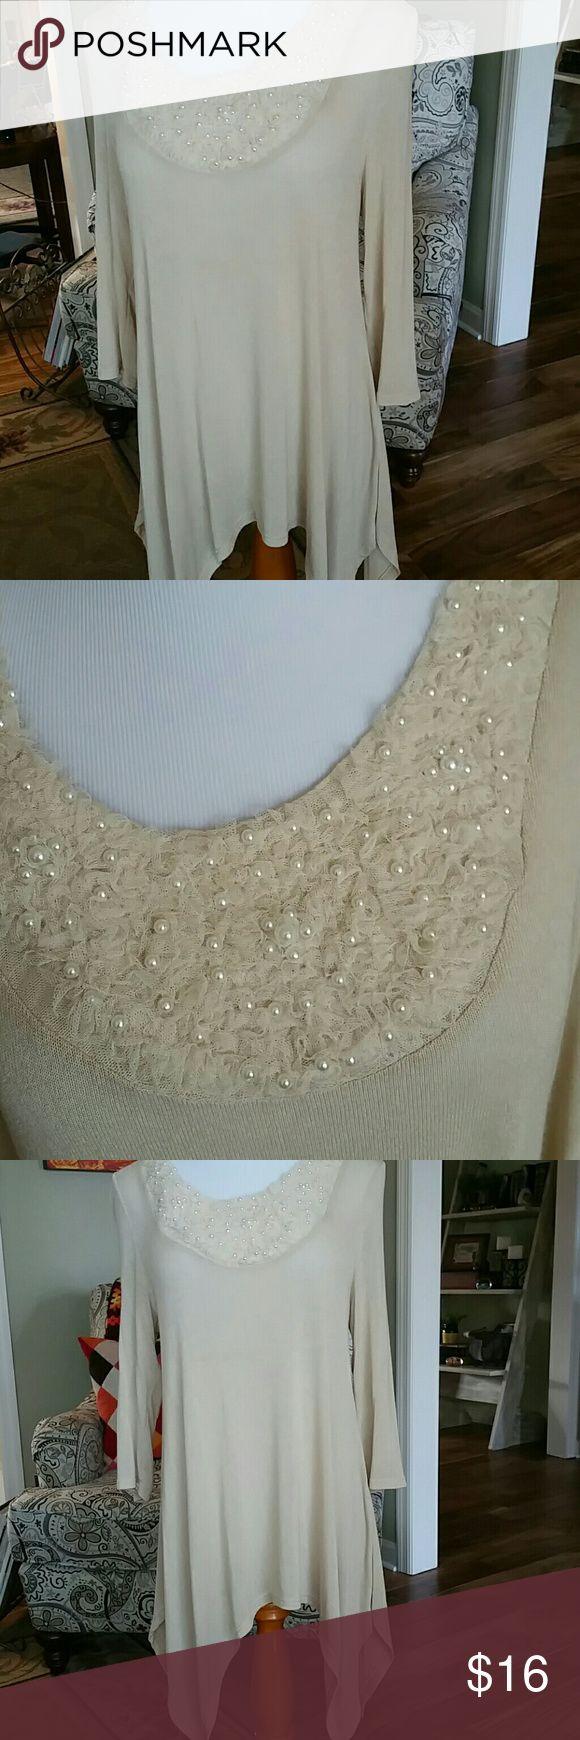 cream embellished hilow top cream sheer knit hilow top